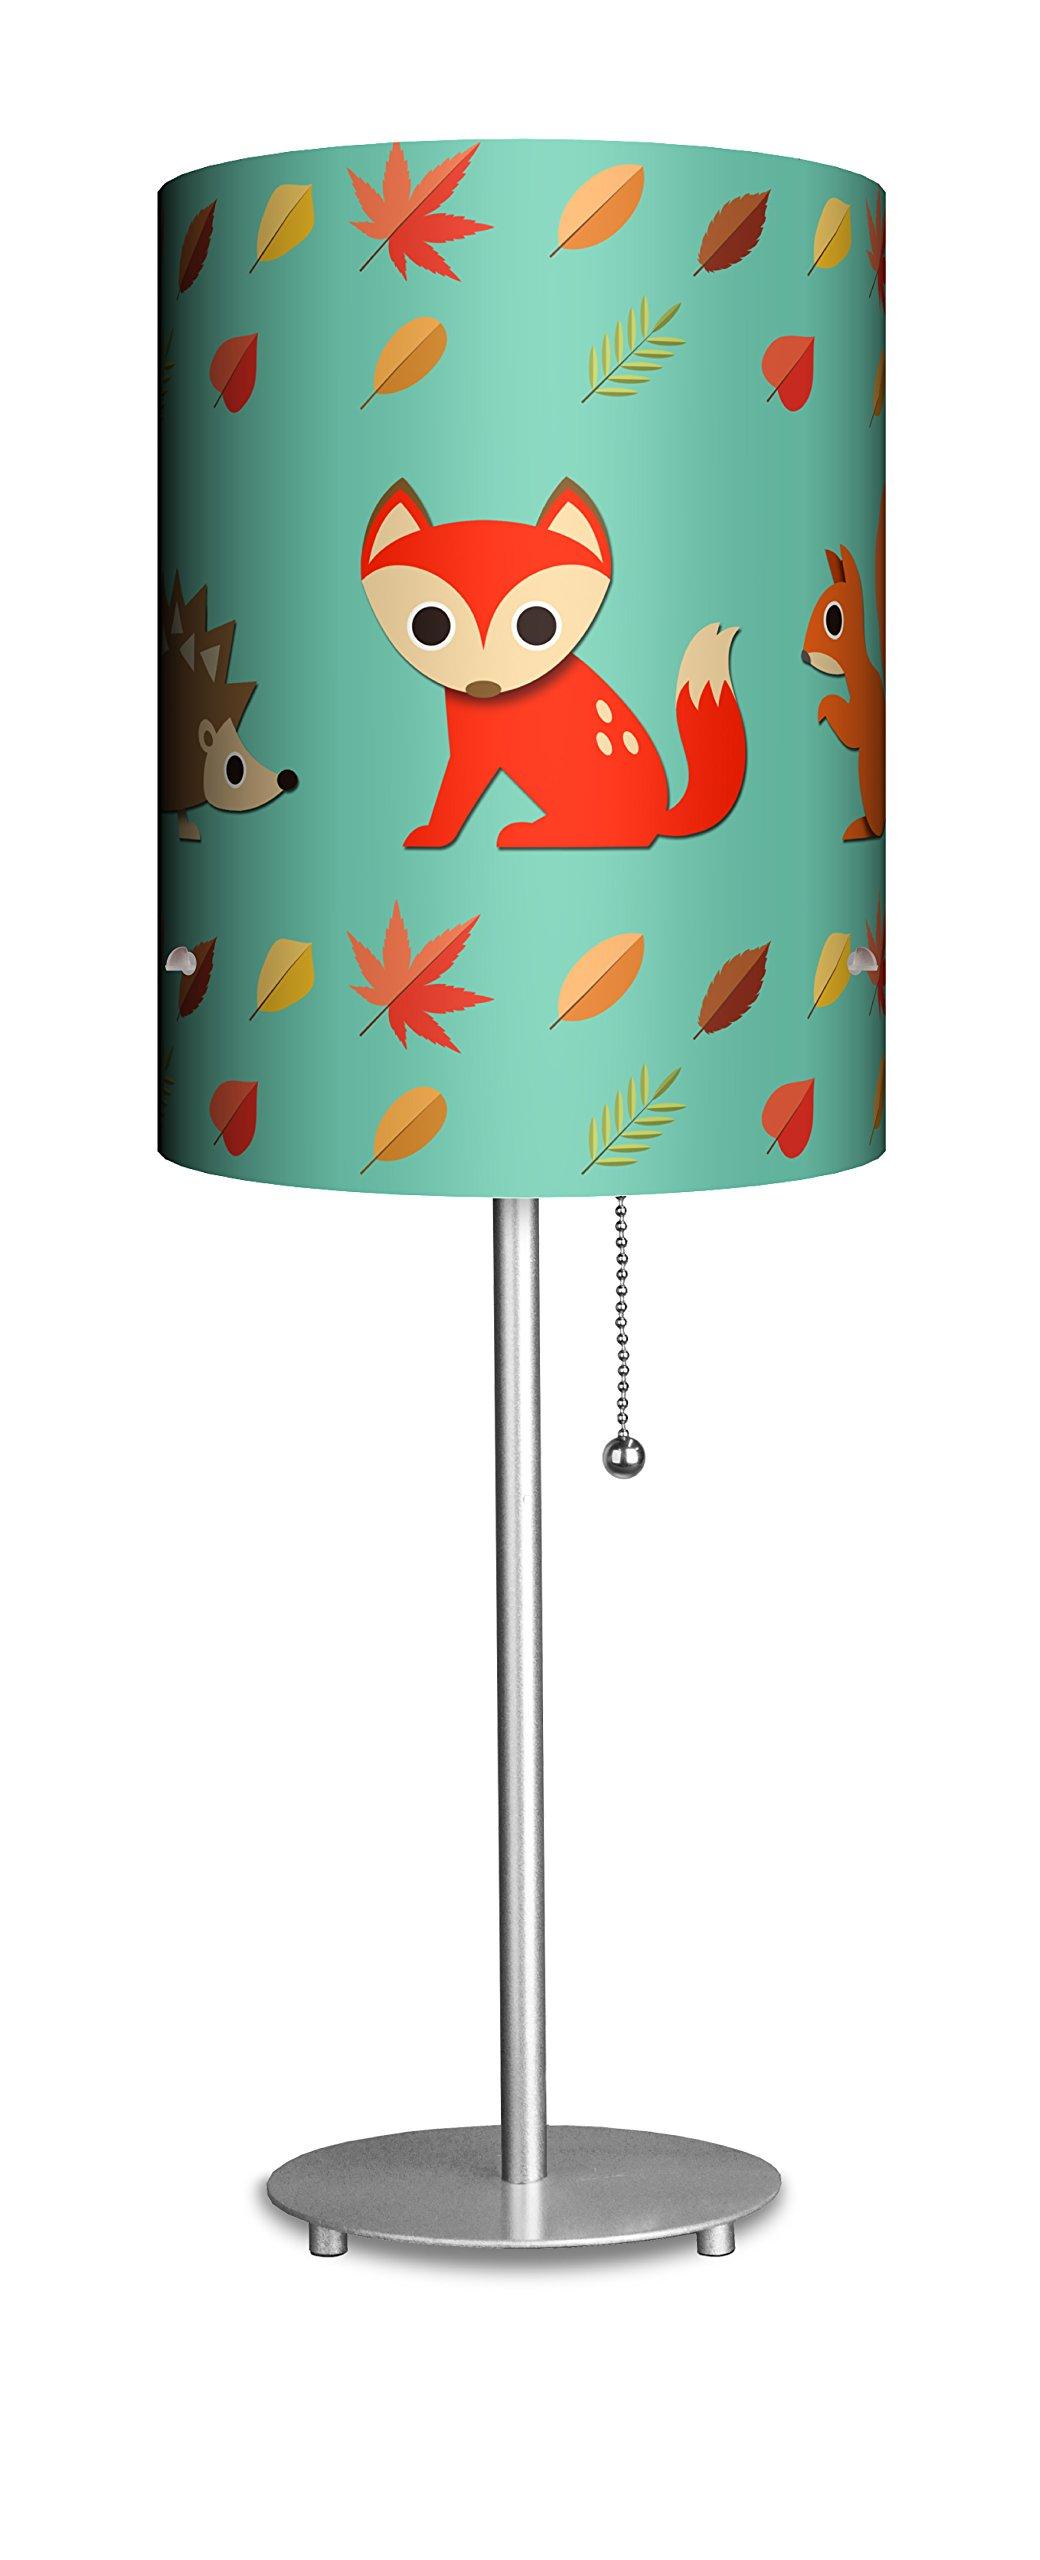 Lampables Children's Collection (Fox) - table desk lamp